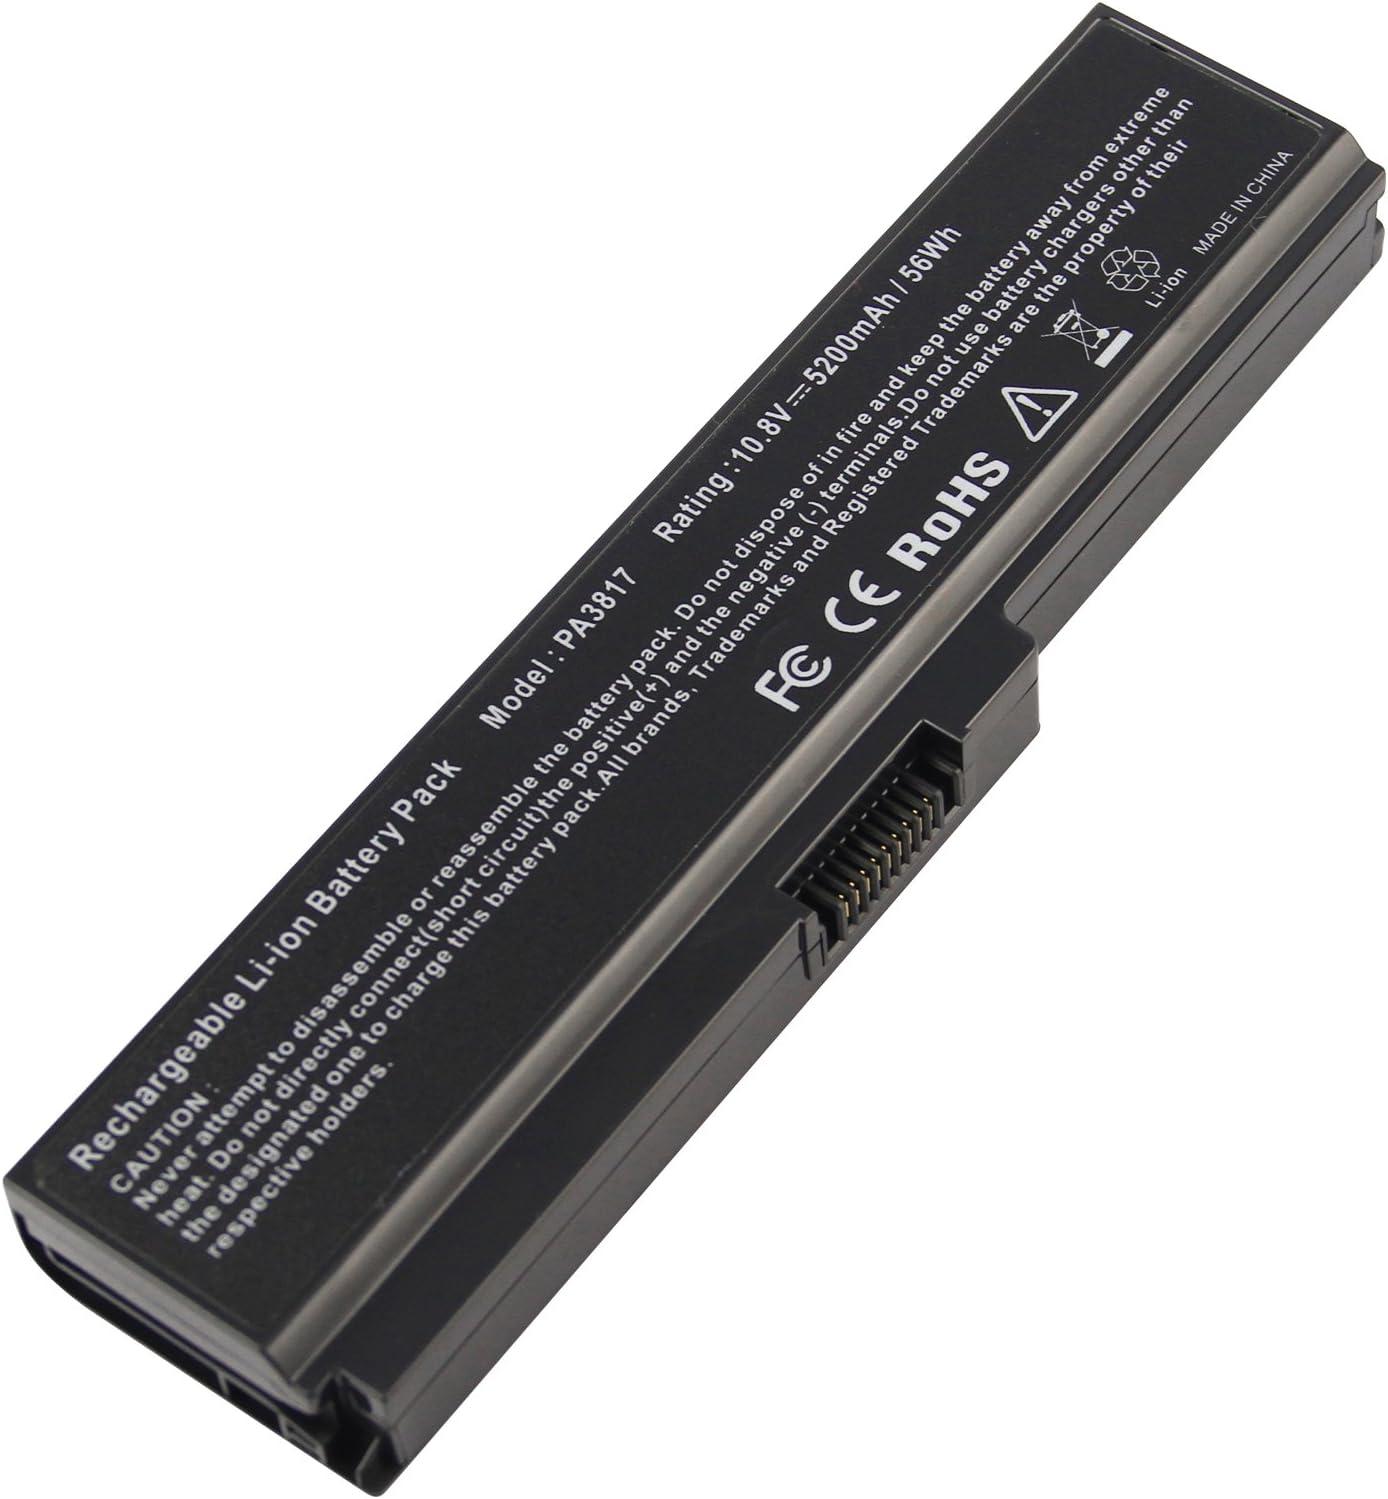 Laptop Battery PA3817U-1BRS PA3818U-1BRS PA3819U-1BRS for Toshiba Satellite C655 C675 C675D L645 L645D L655 L655D L675 L675D L745 L755 L755D P745 P755 P775 M645 A660 A655 PA3817U Series Battery